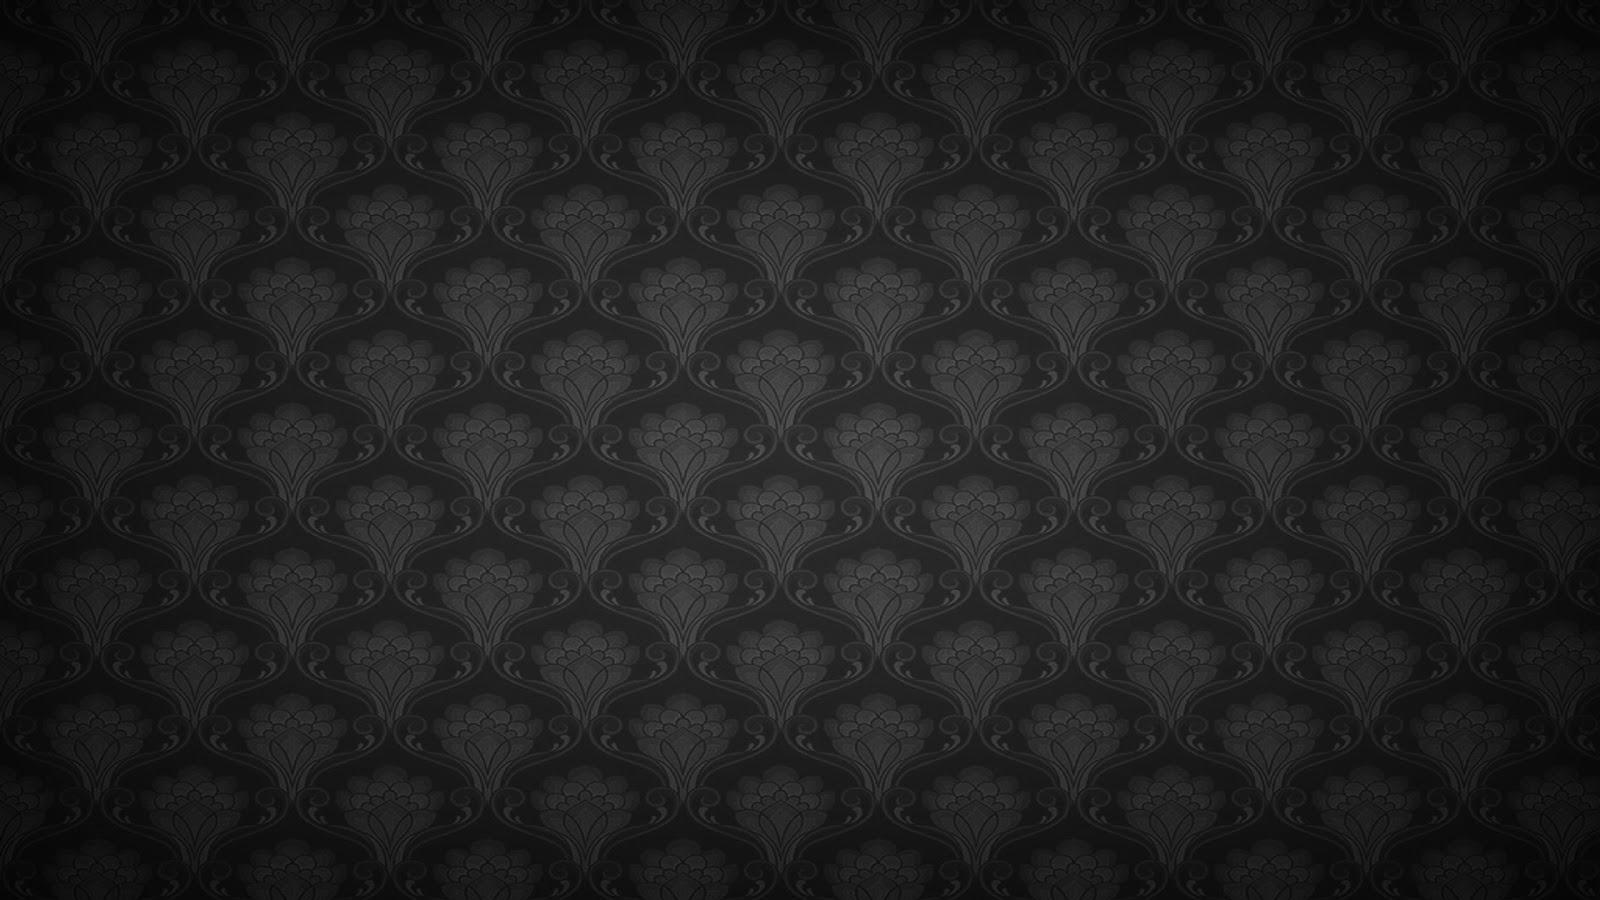 trendy wallpaper hd black   hd wallpaper backgrounds free desktop wallpapers